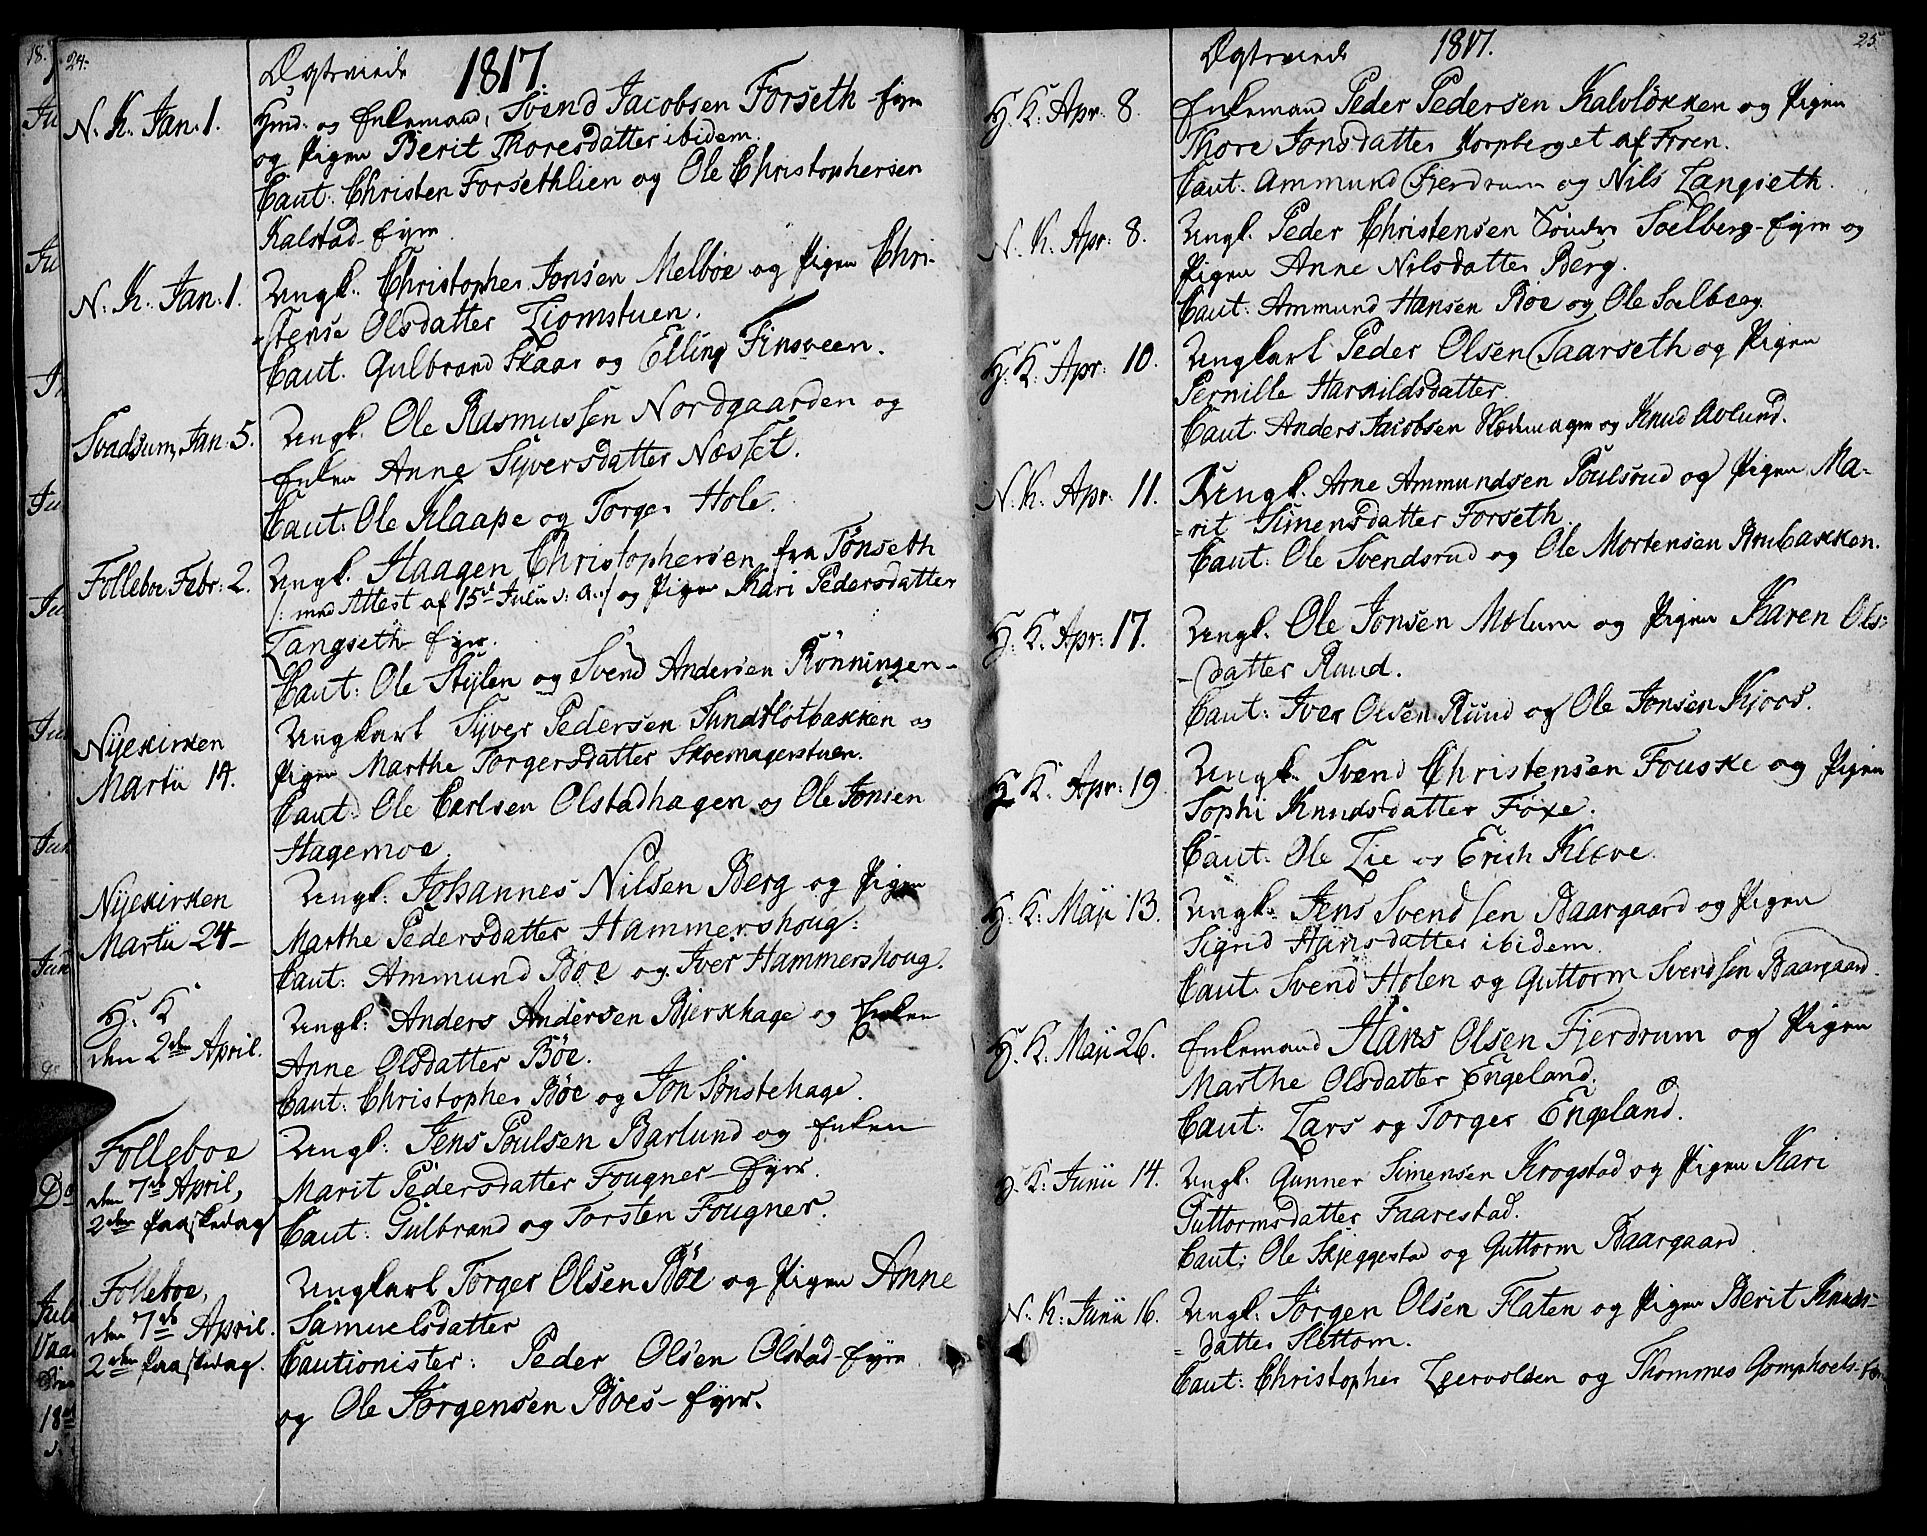 SAH, Gausdal prestekontor, Ministerialbok nr. 4, 1809-1817, s. 24-25